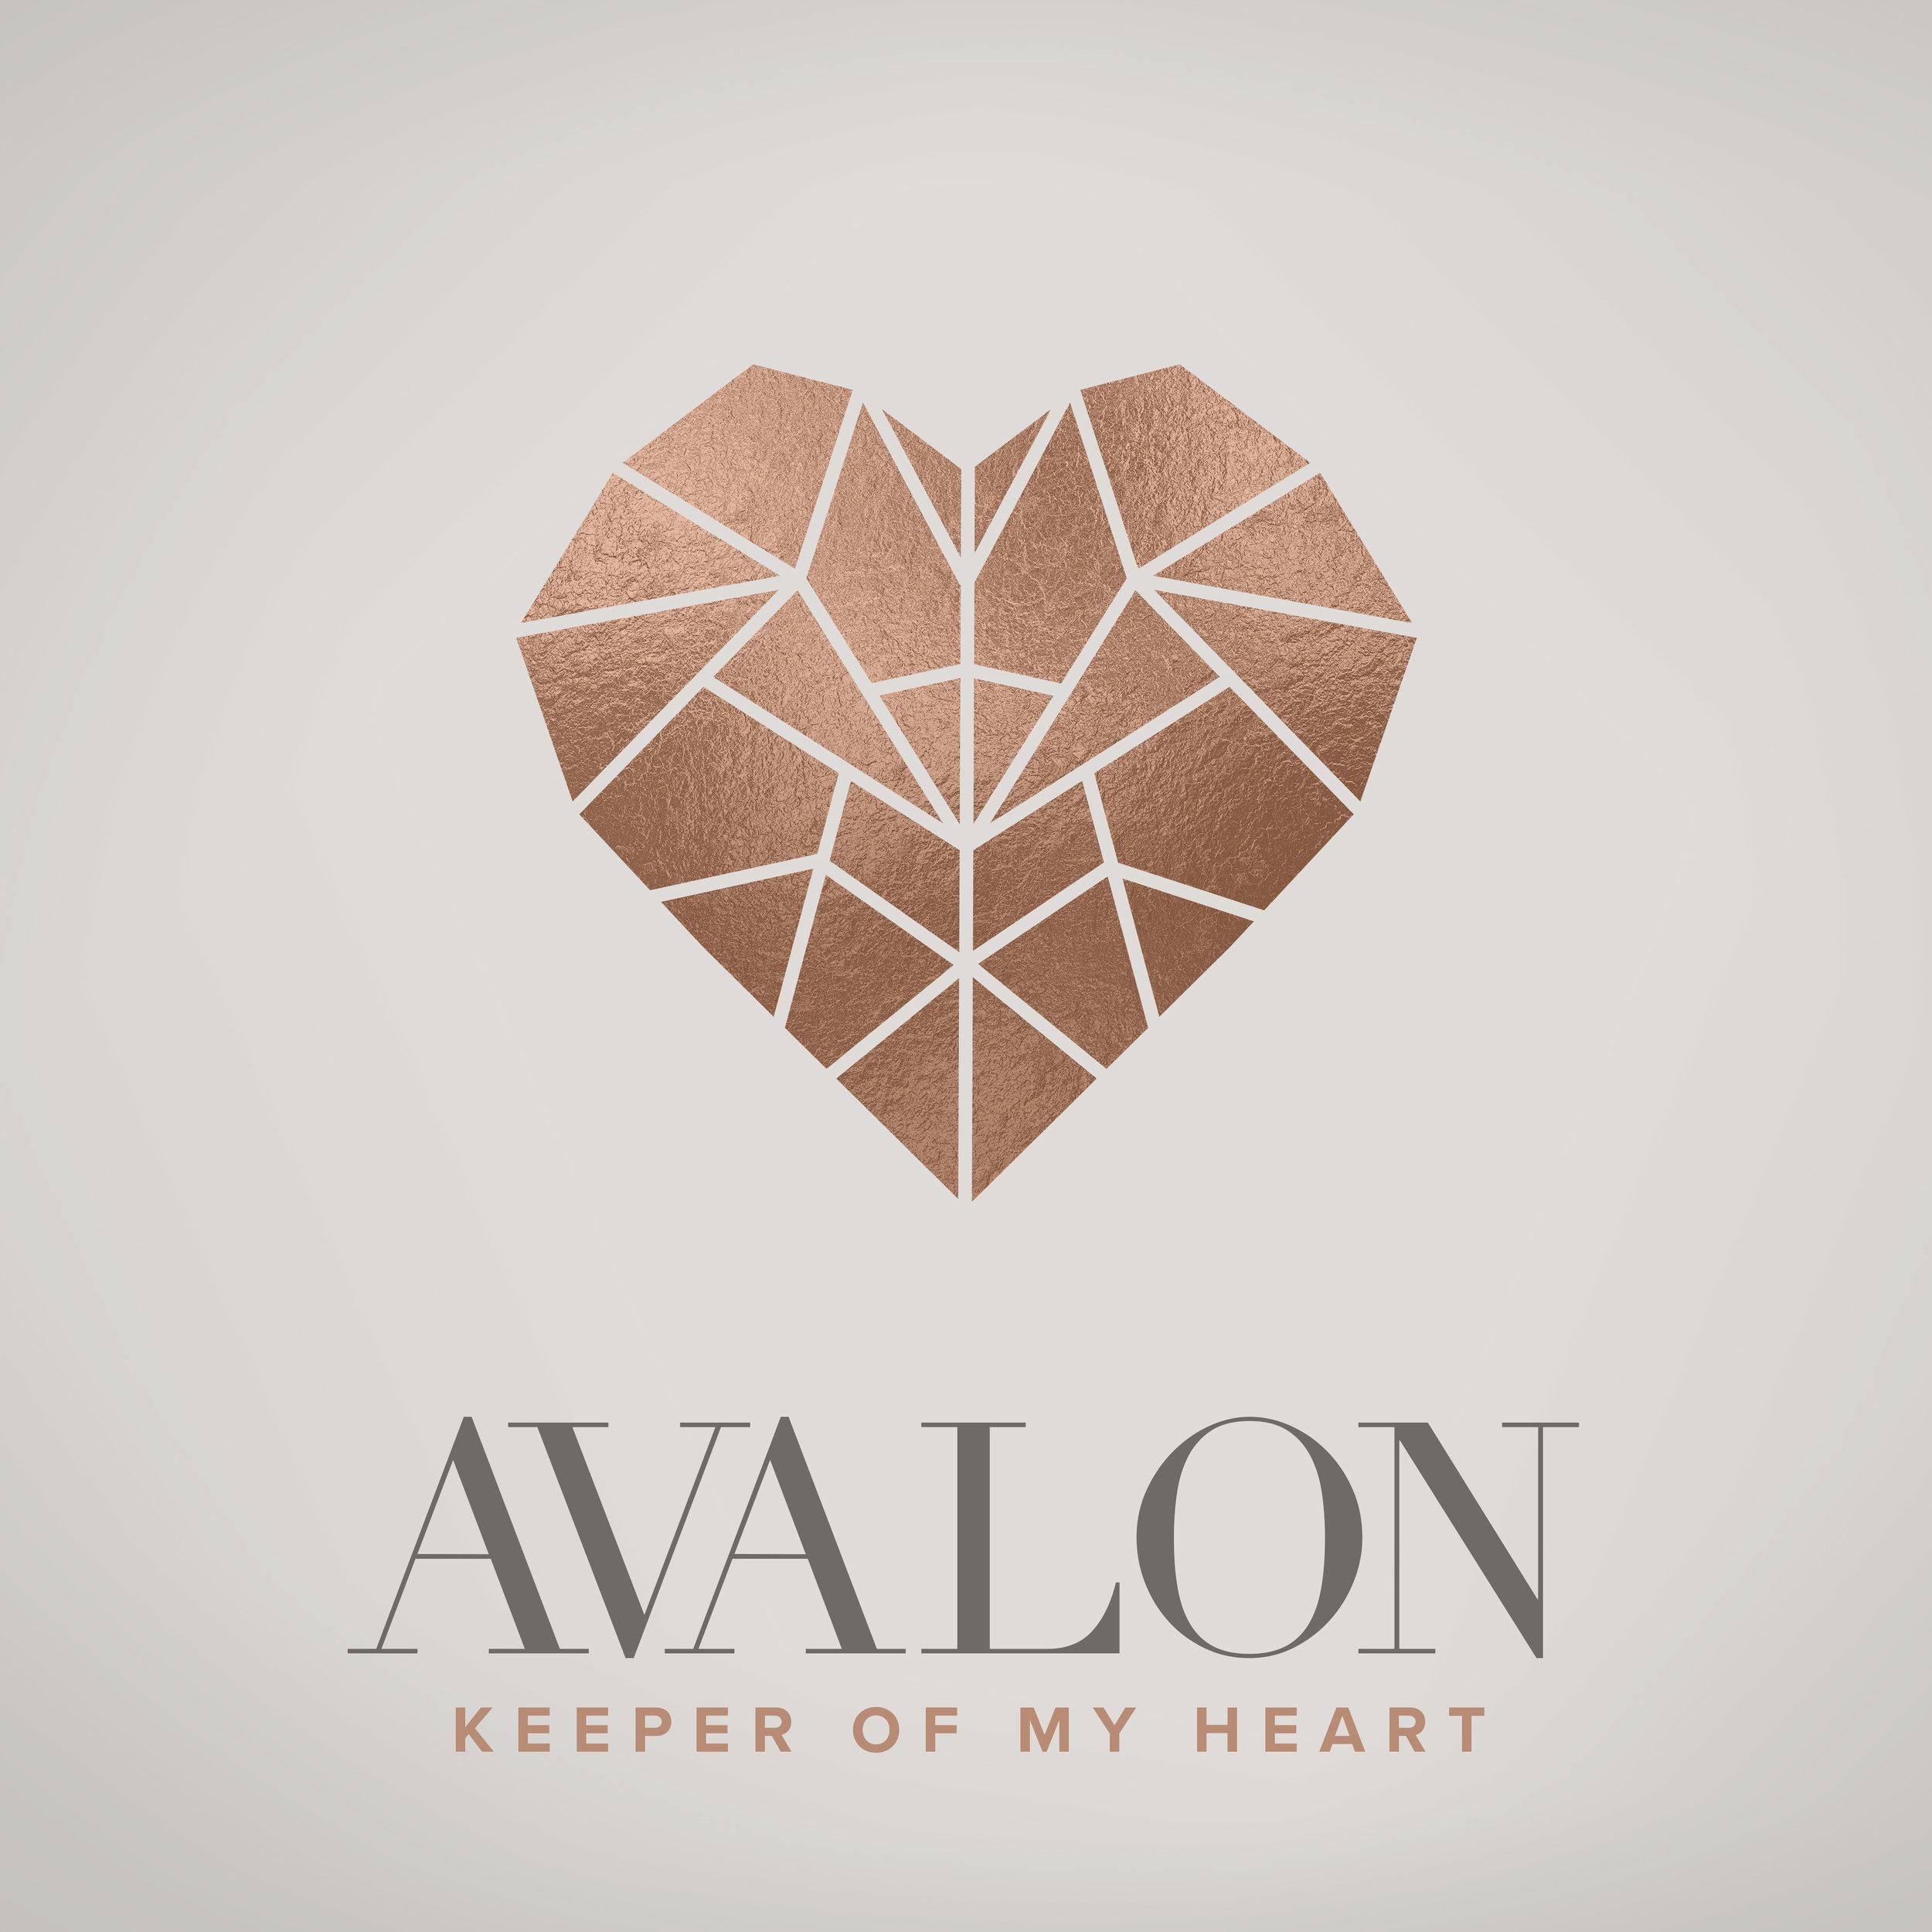 Avalon-Keeper-CoverArt.jpg